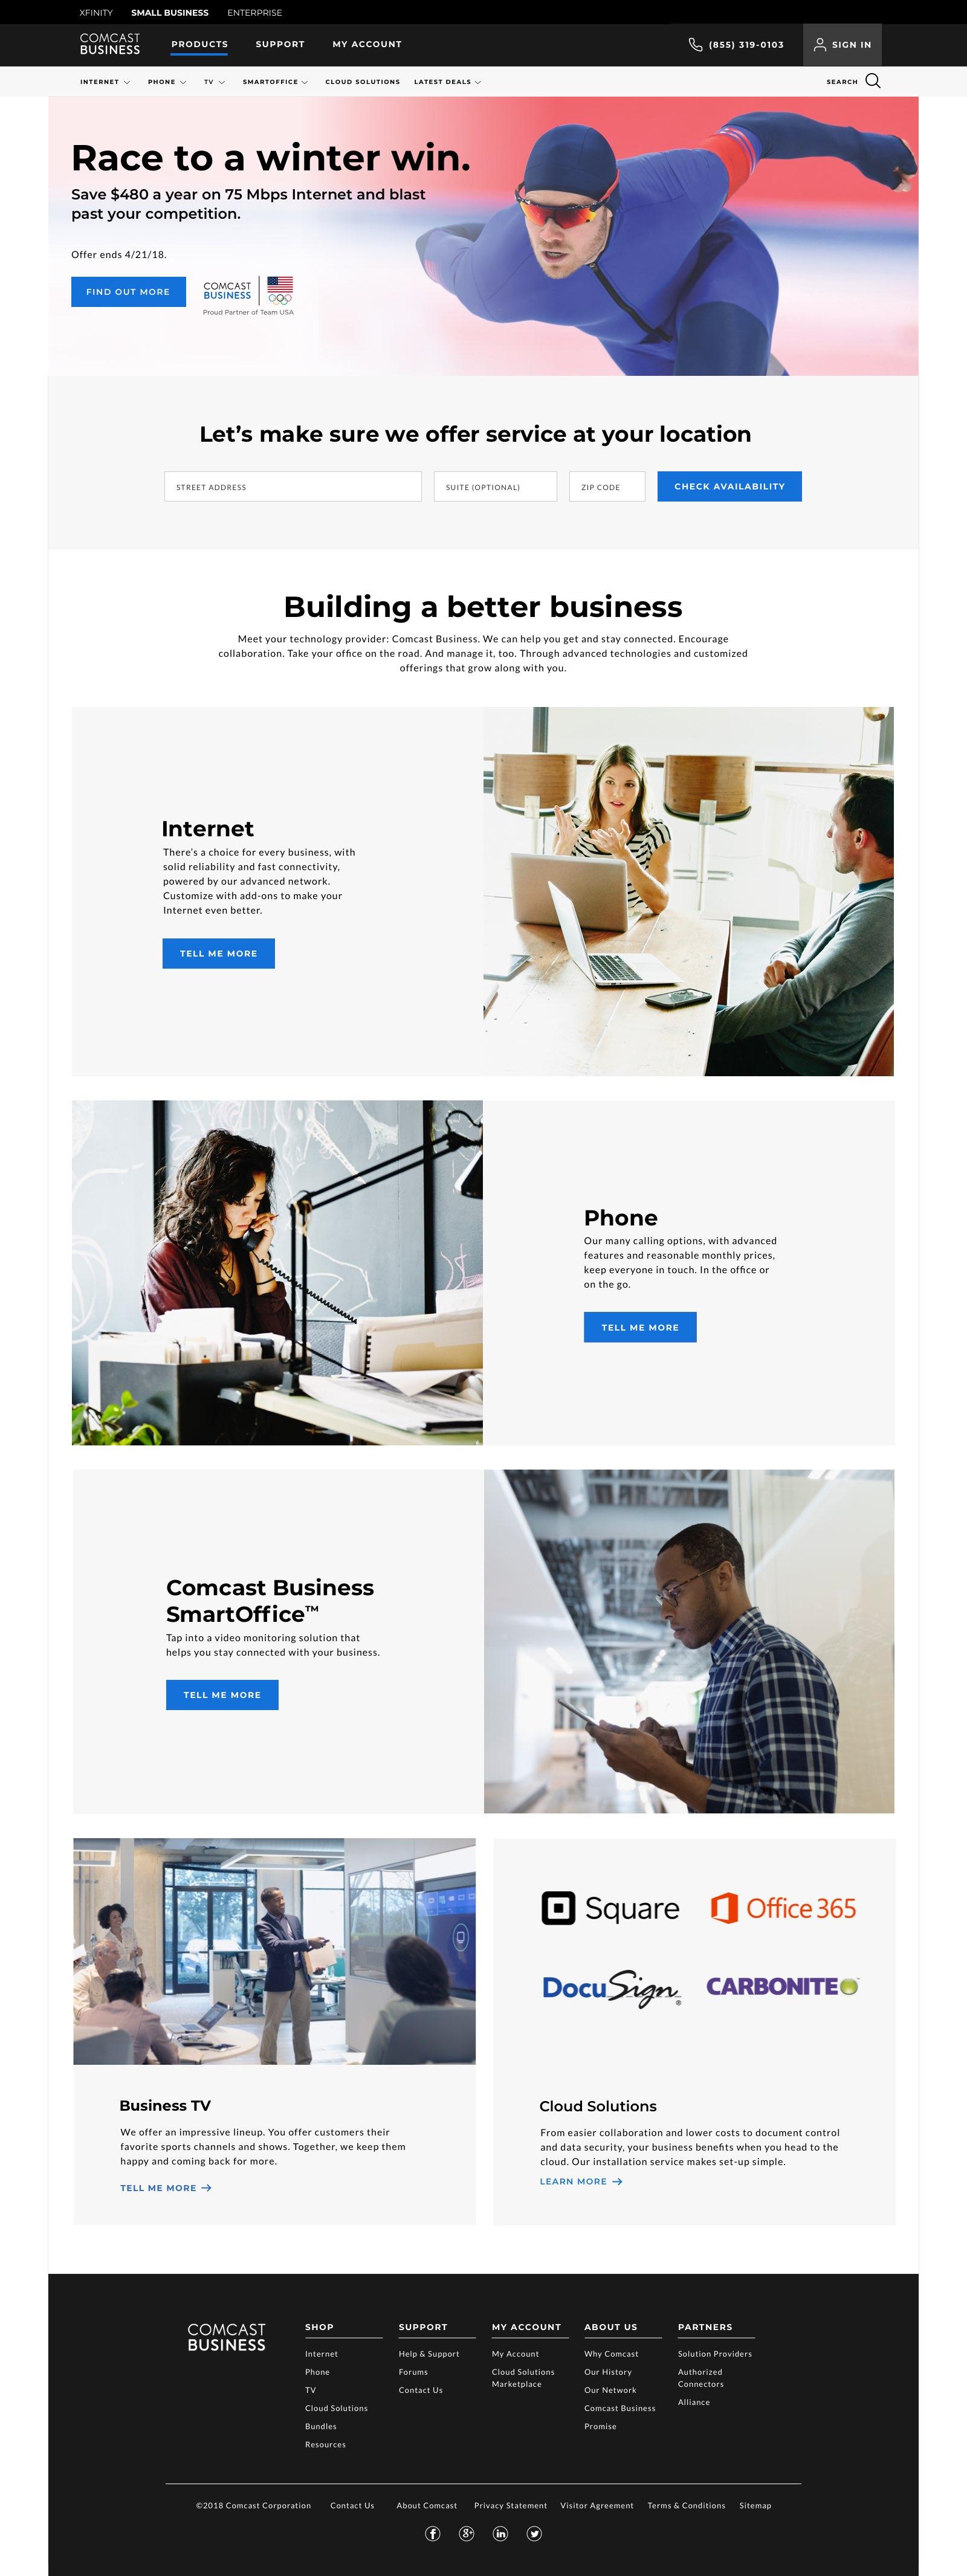 SMB Homepage - Campaign